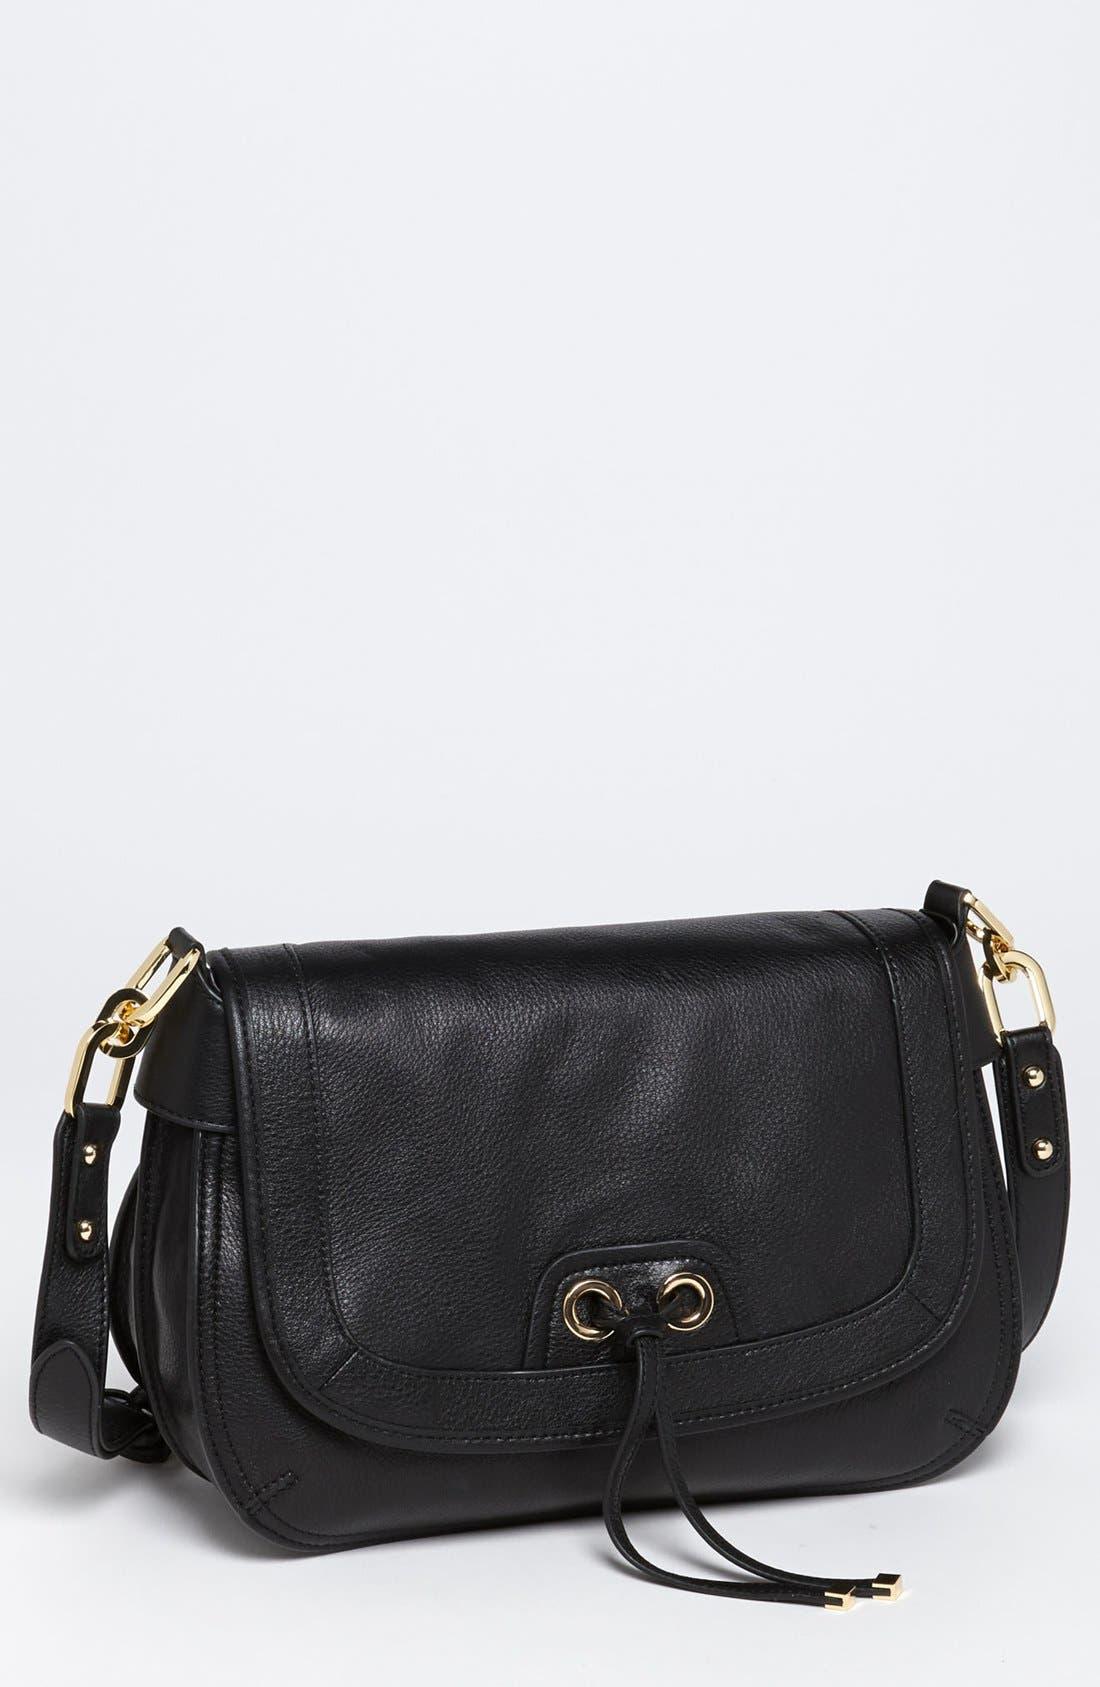 Alternate Image 1 Selected - Perlina 'Simone' Leather Crossbody Bag